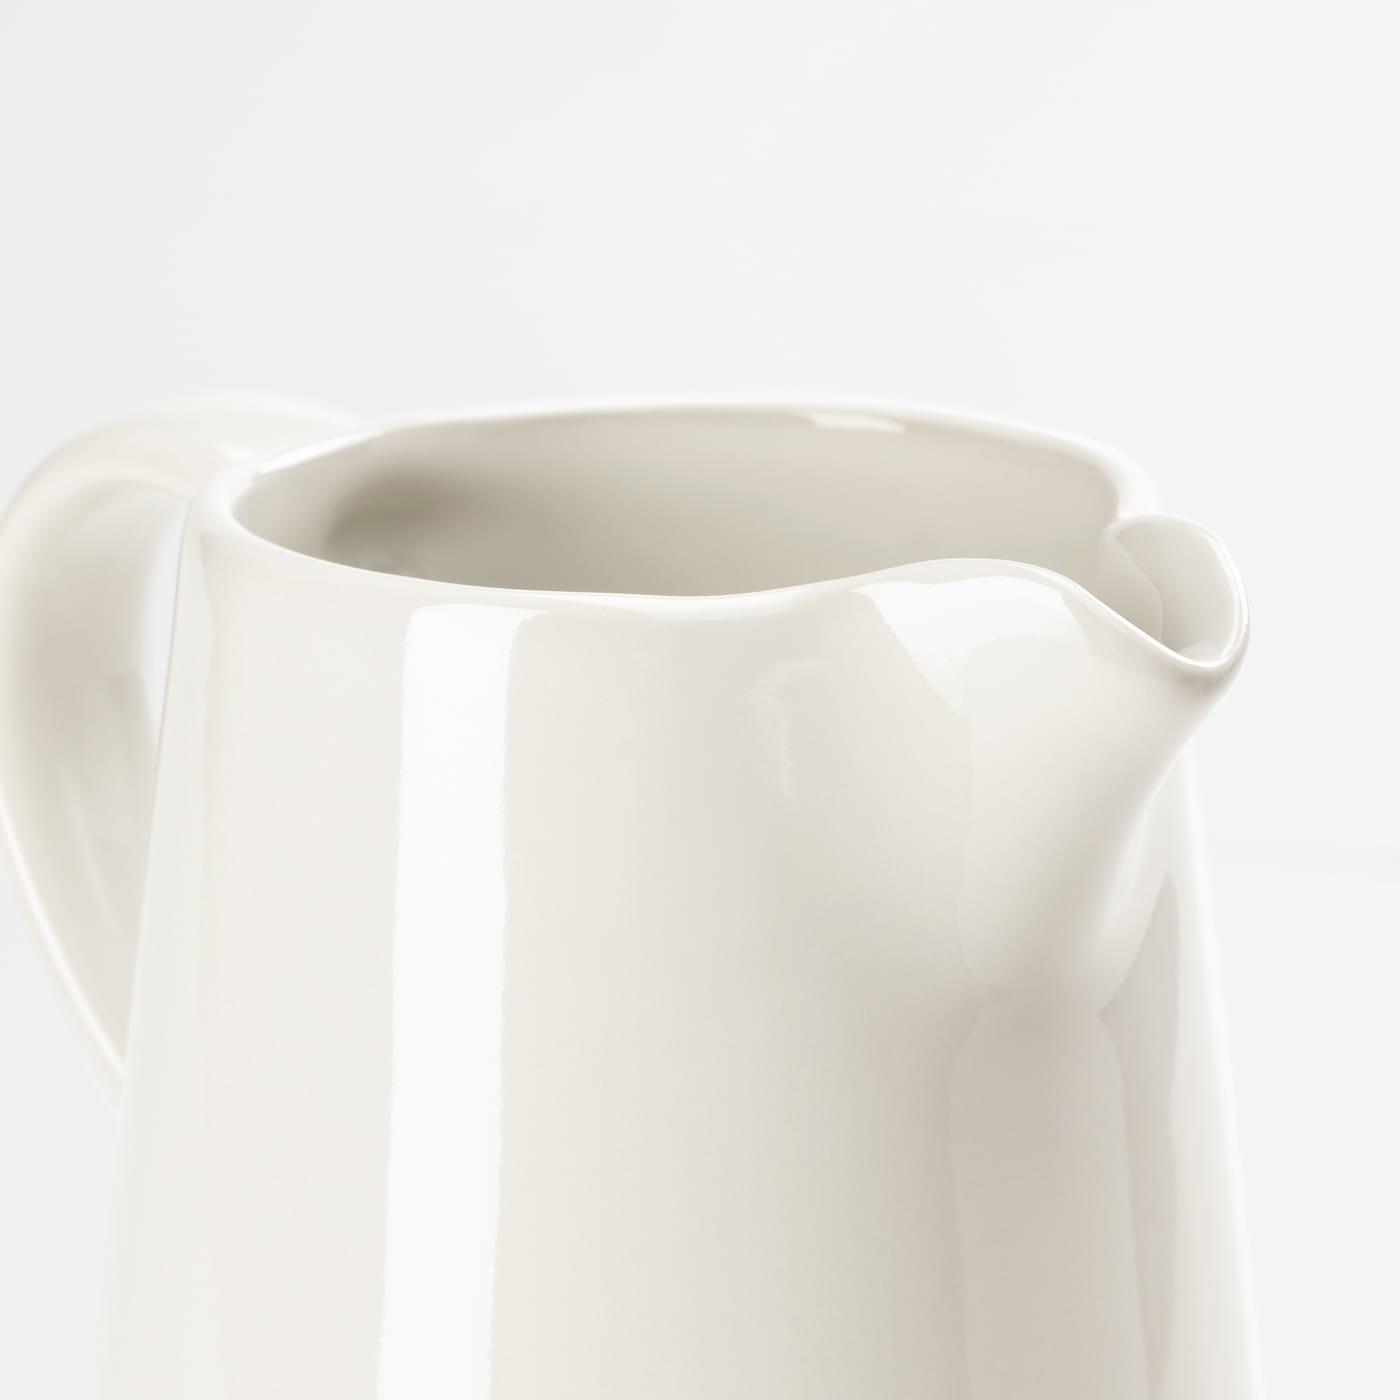 VARDAGEN Milk/cream jug, off-white, 39 cl